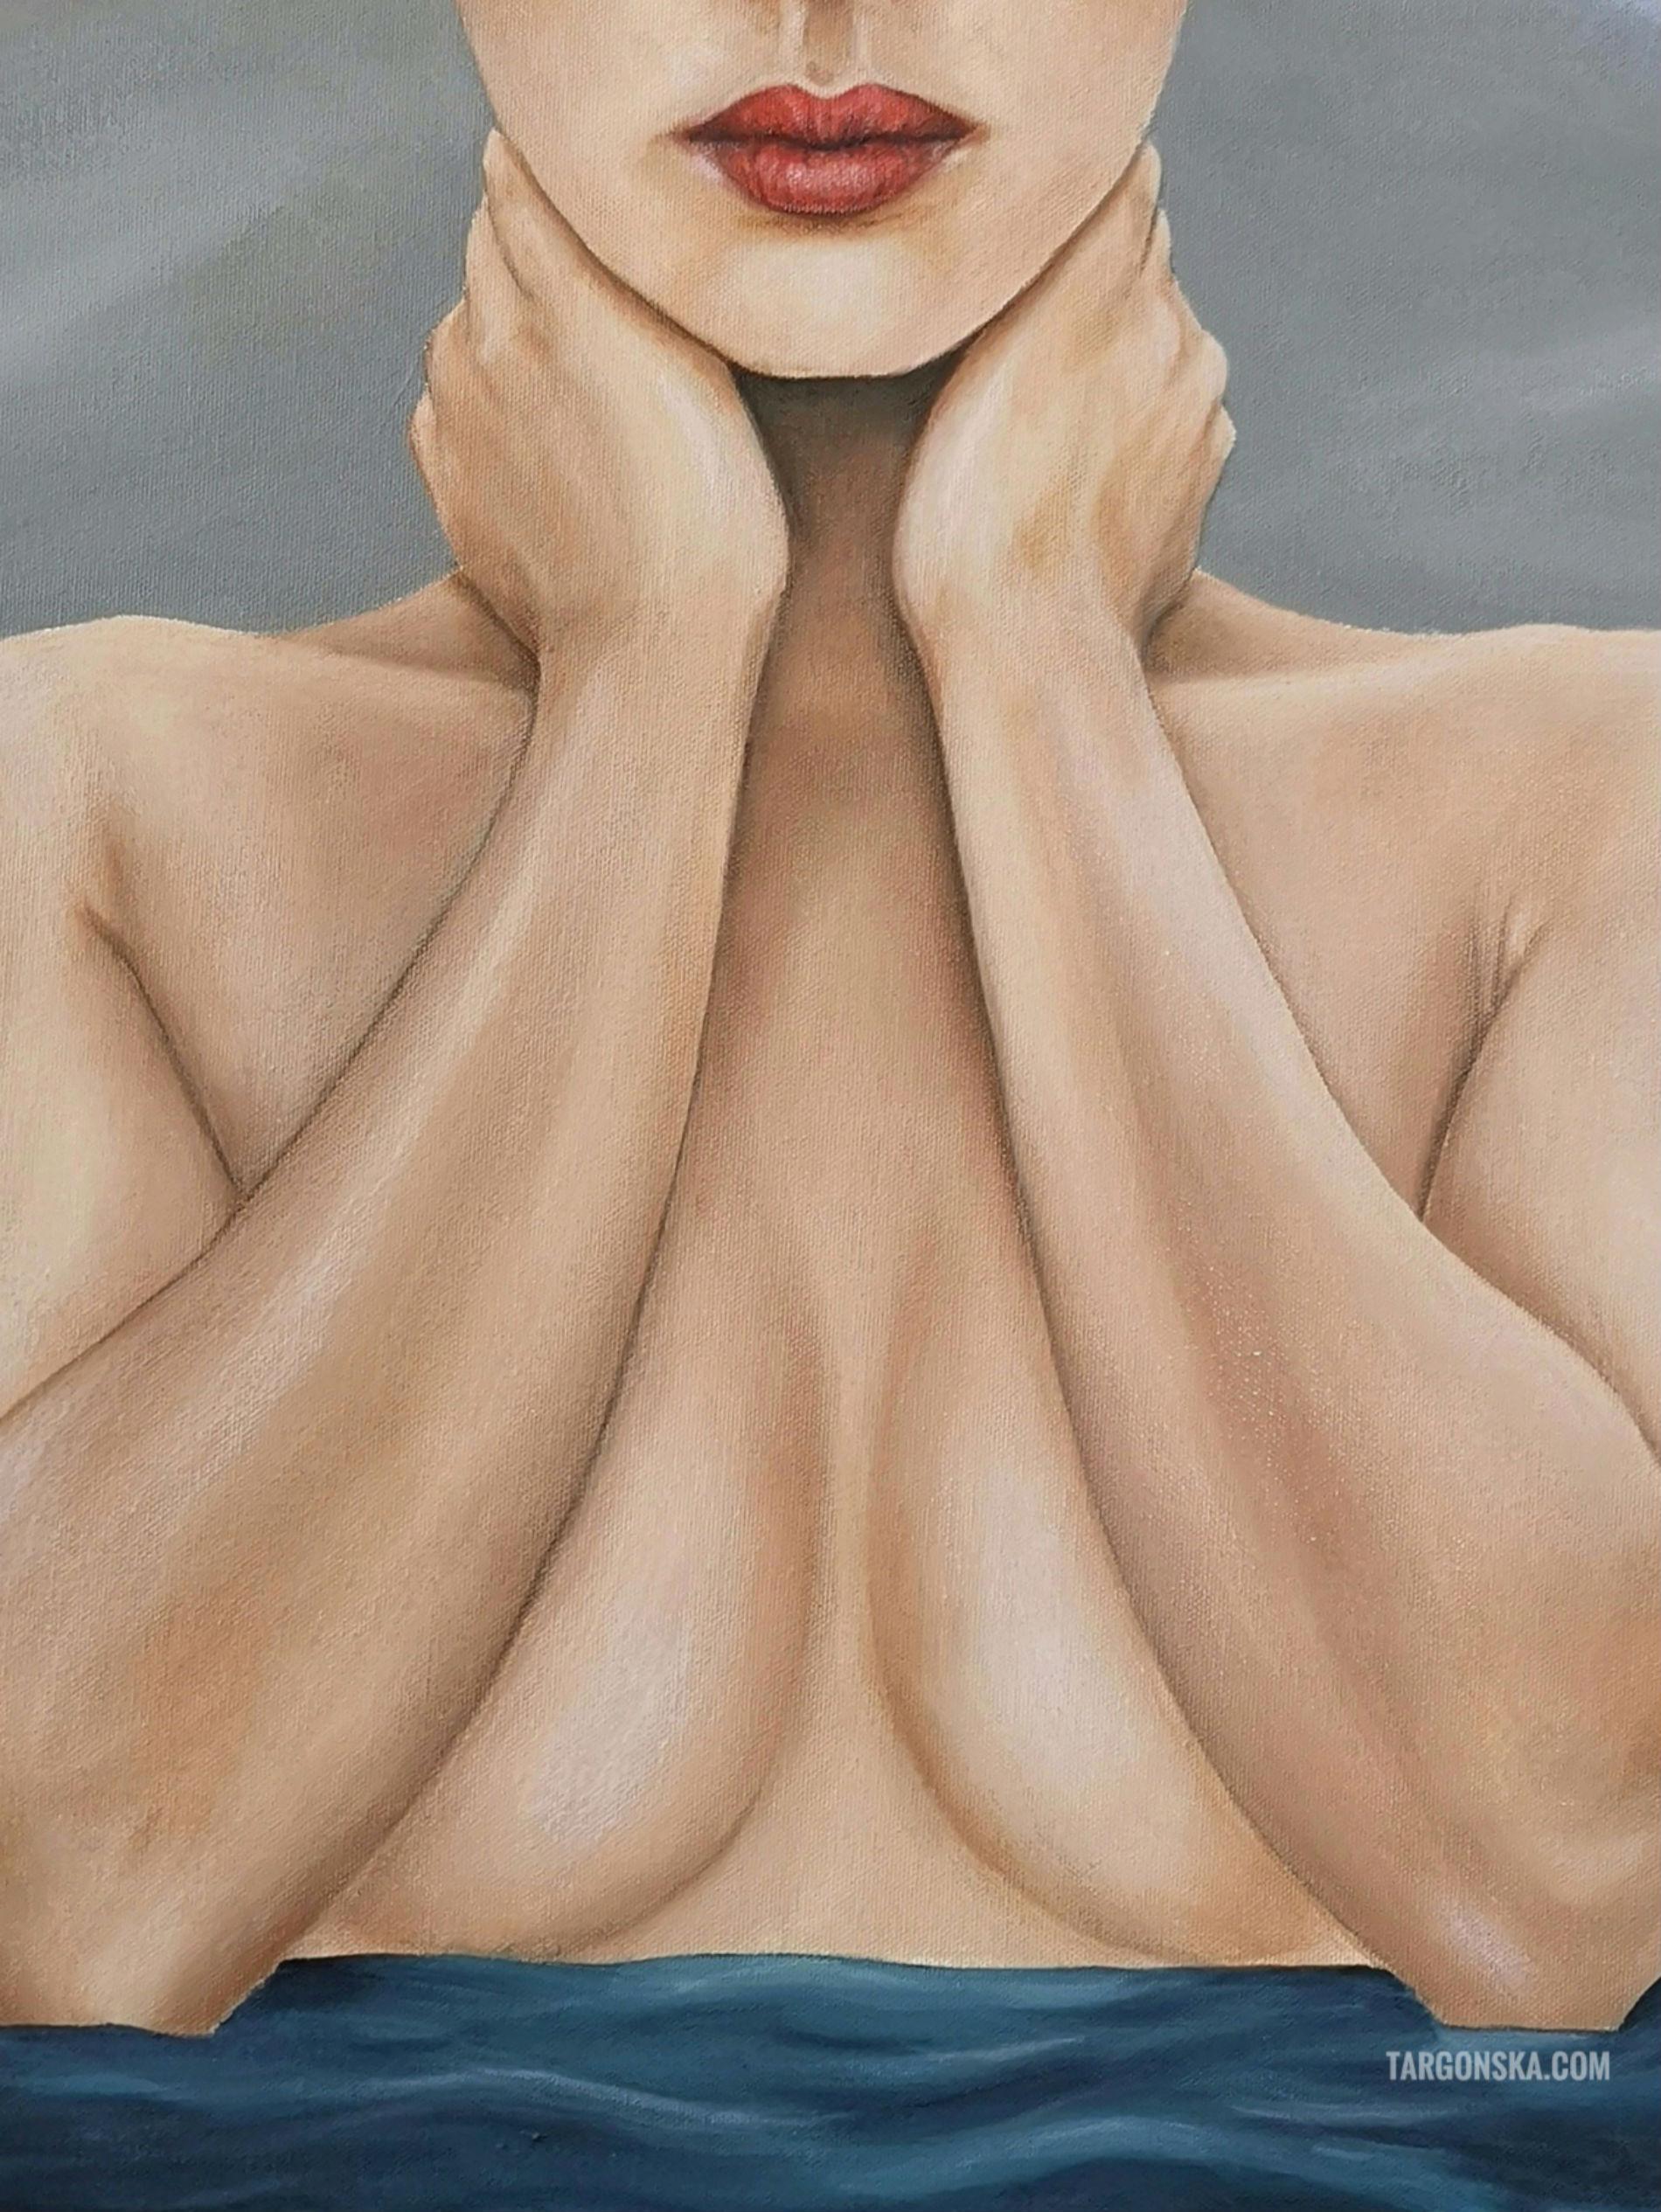 mouth face Her clouds malgorzata targonska paintings